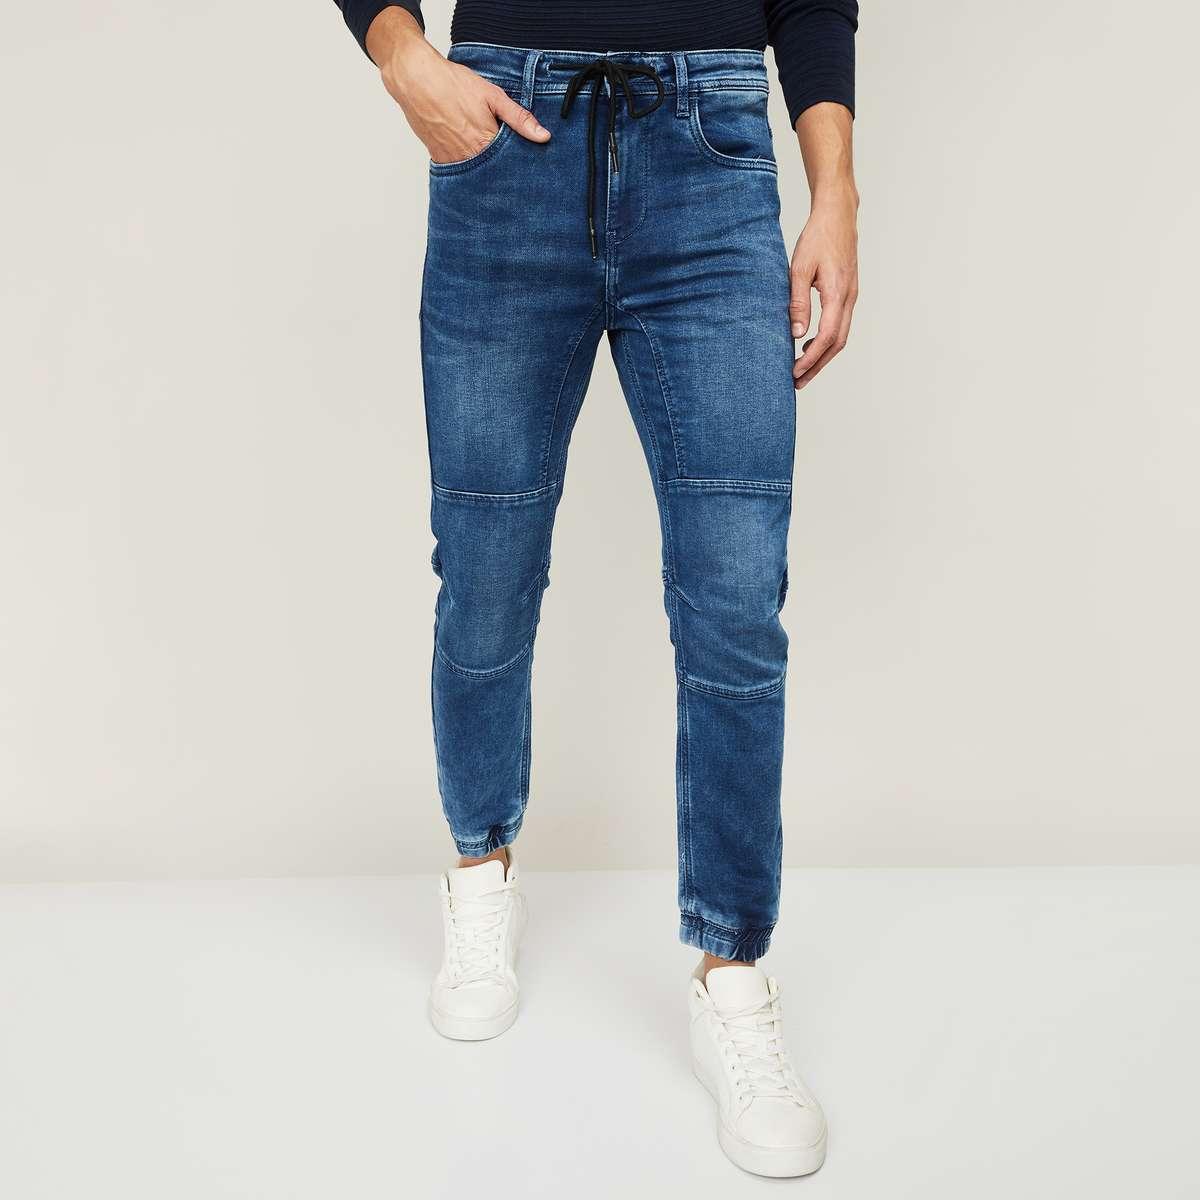 1.FORCA Men Stonewashed Jogger Jeans